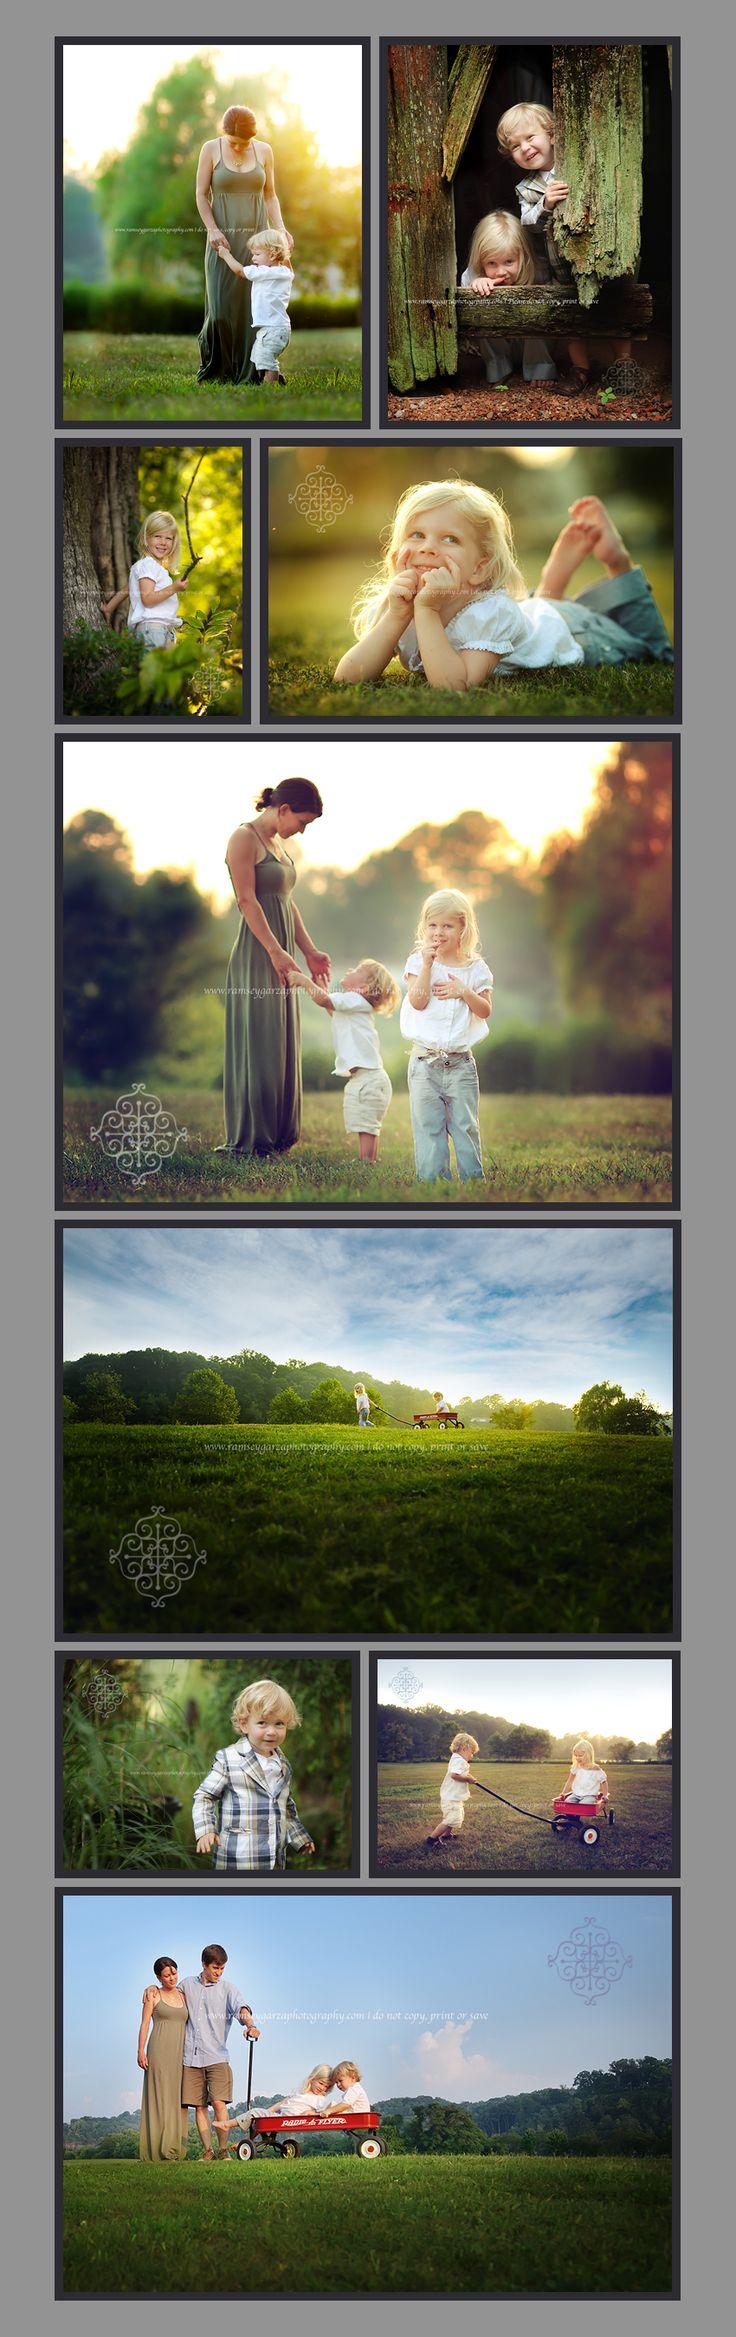 Beautiful family photos. Love the lighting